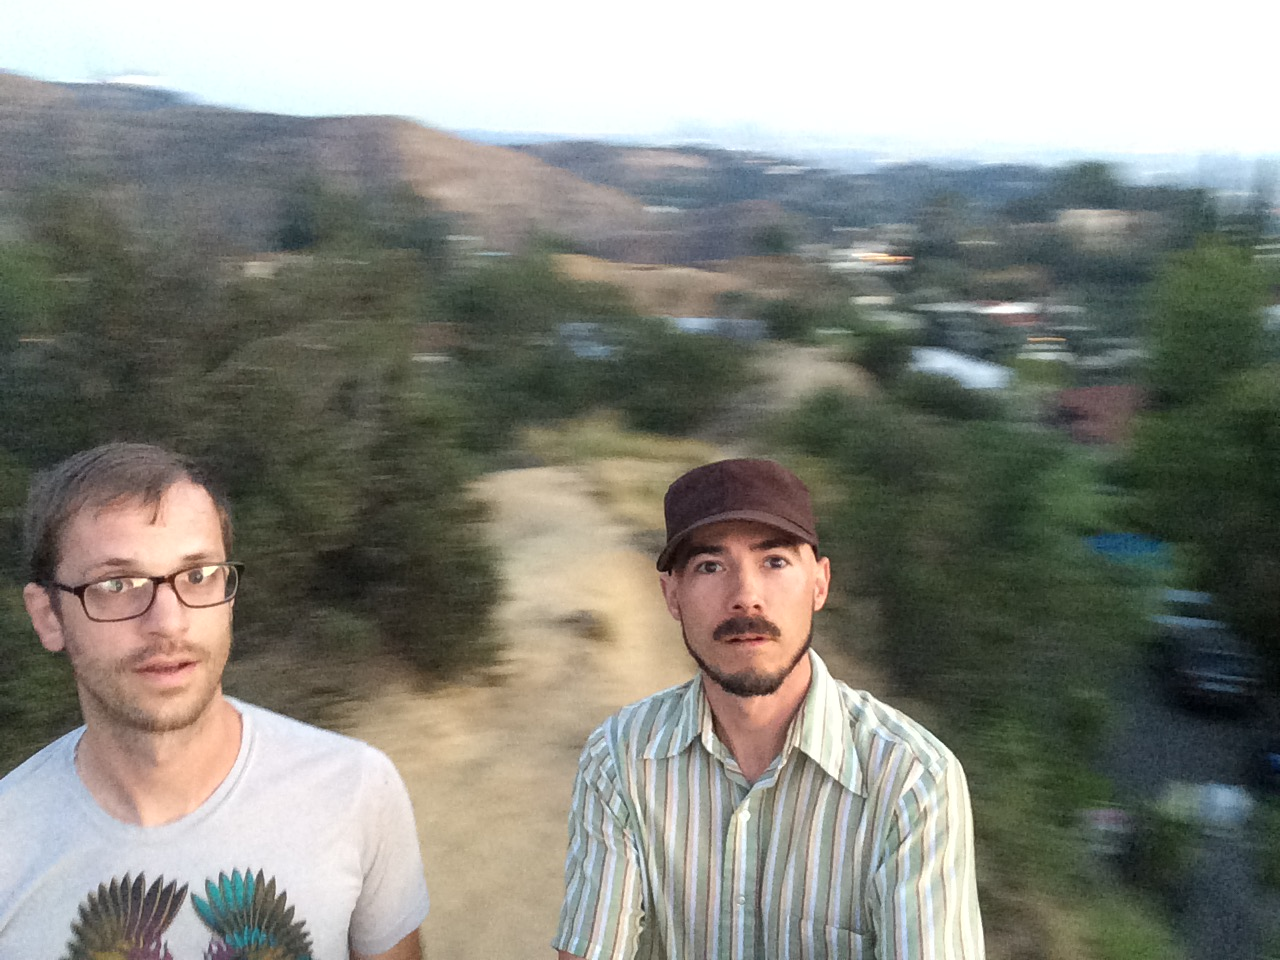 Hollywood Hills!